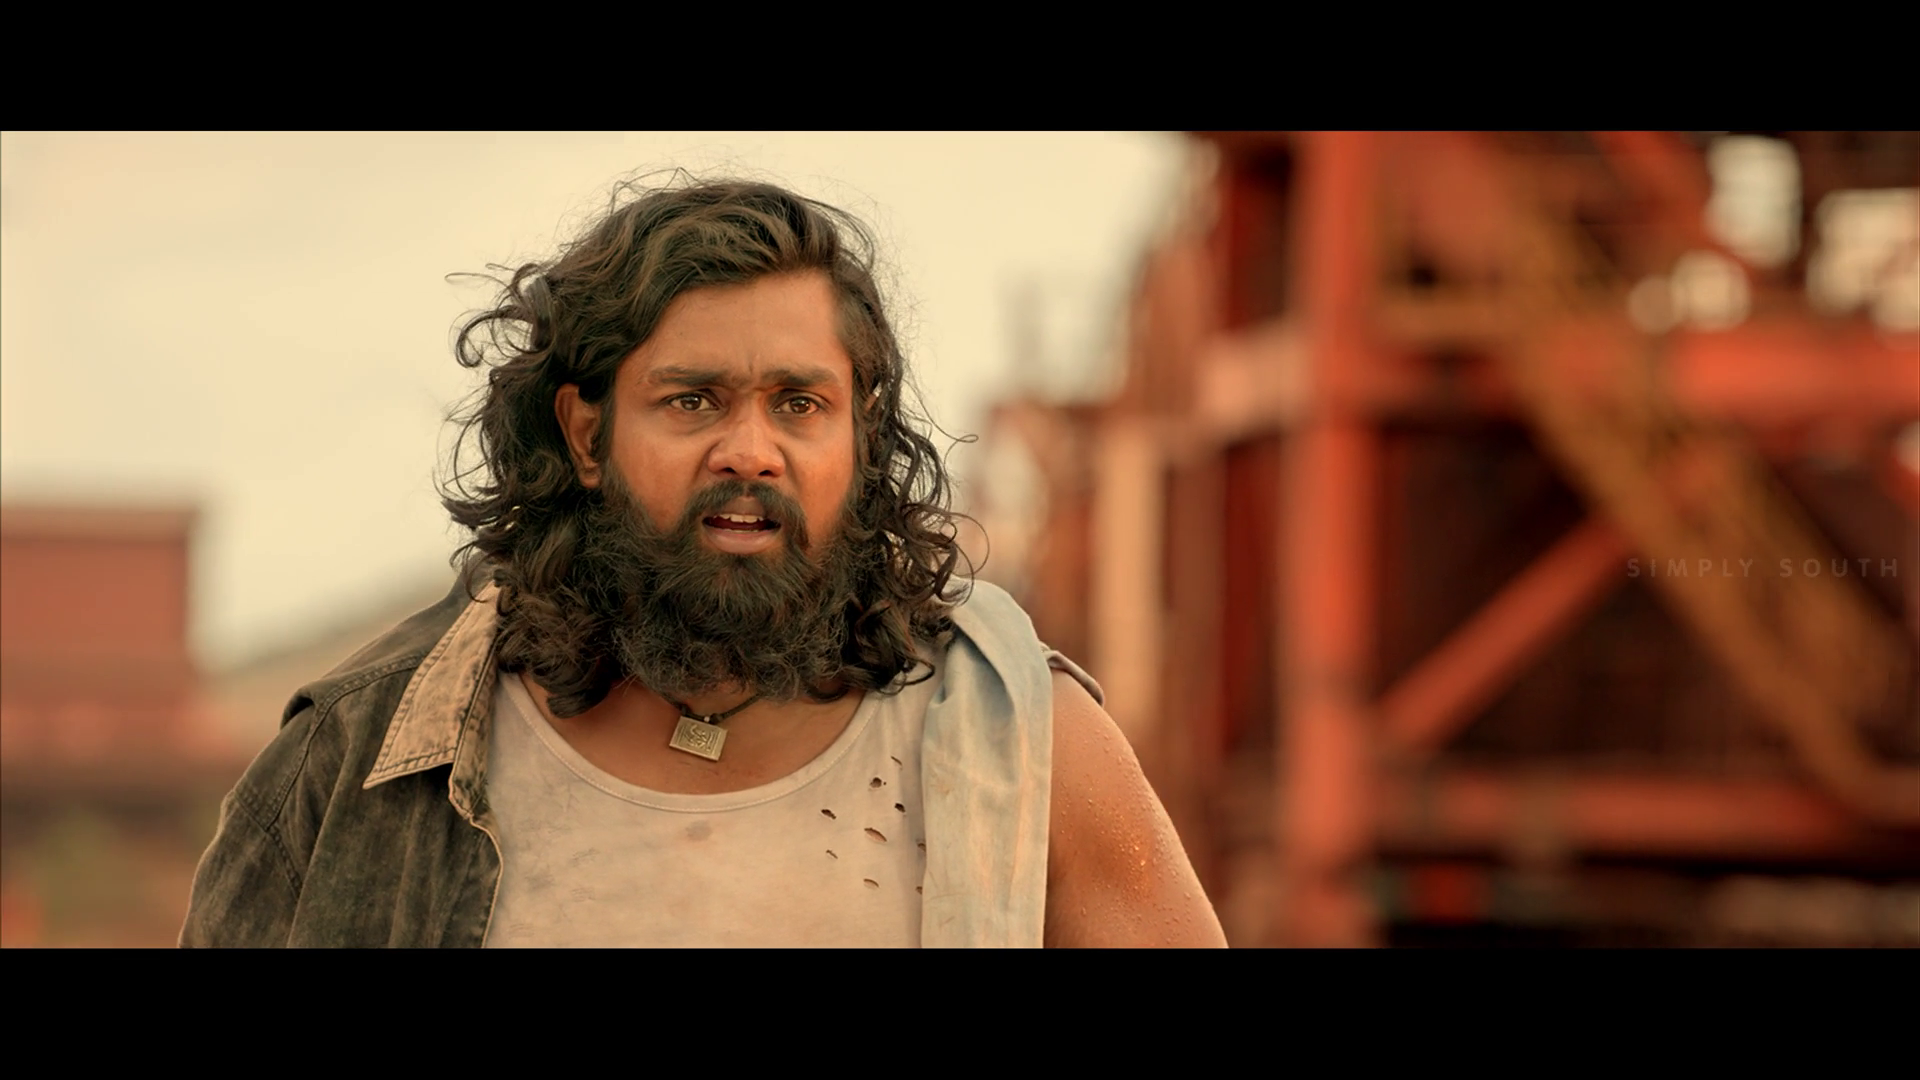 Pogaru (2021) 1080p WEB-DL H264 DD5 1 [Multi Audio][Hindi+Tamil+Kannada] DUS Exclusive